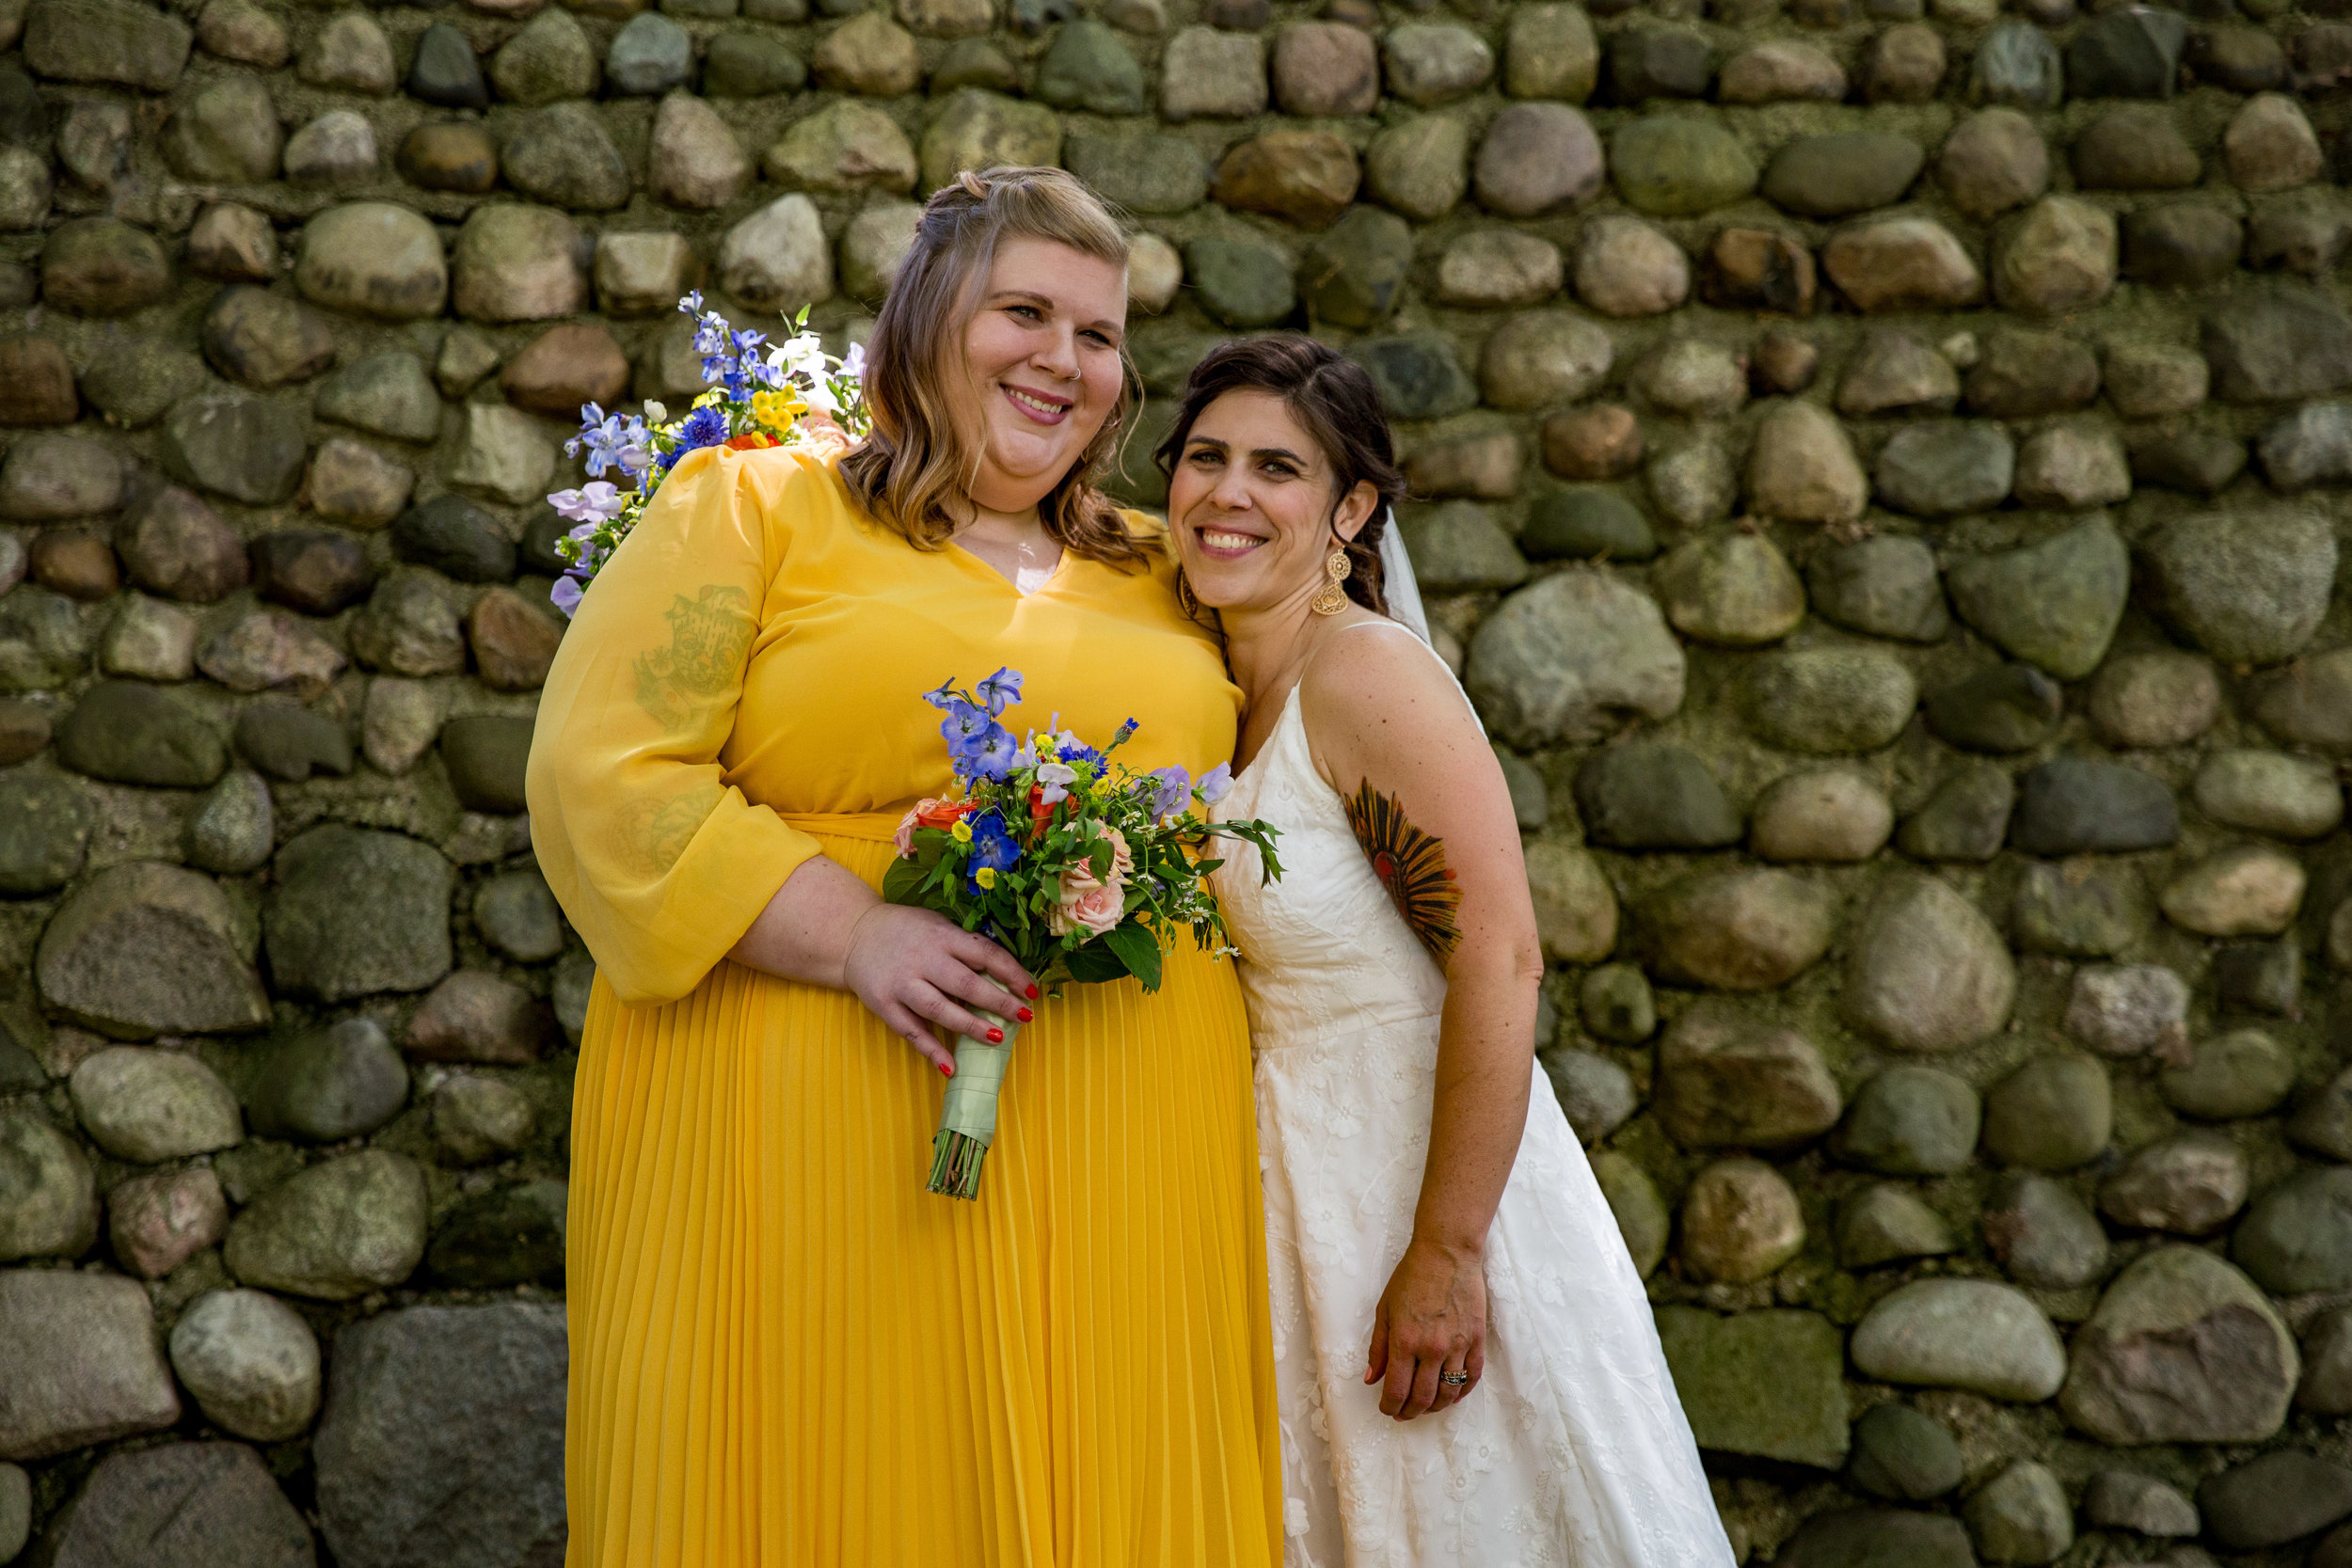 Natalie and Dallas Mooney Wedding 6-8-19_Tania Watt Photography-347.jpg